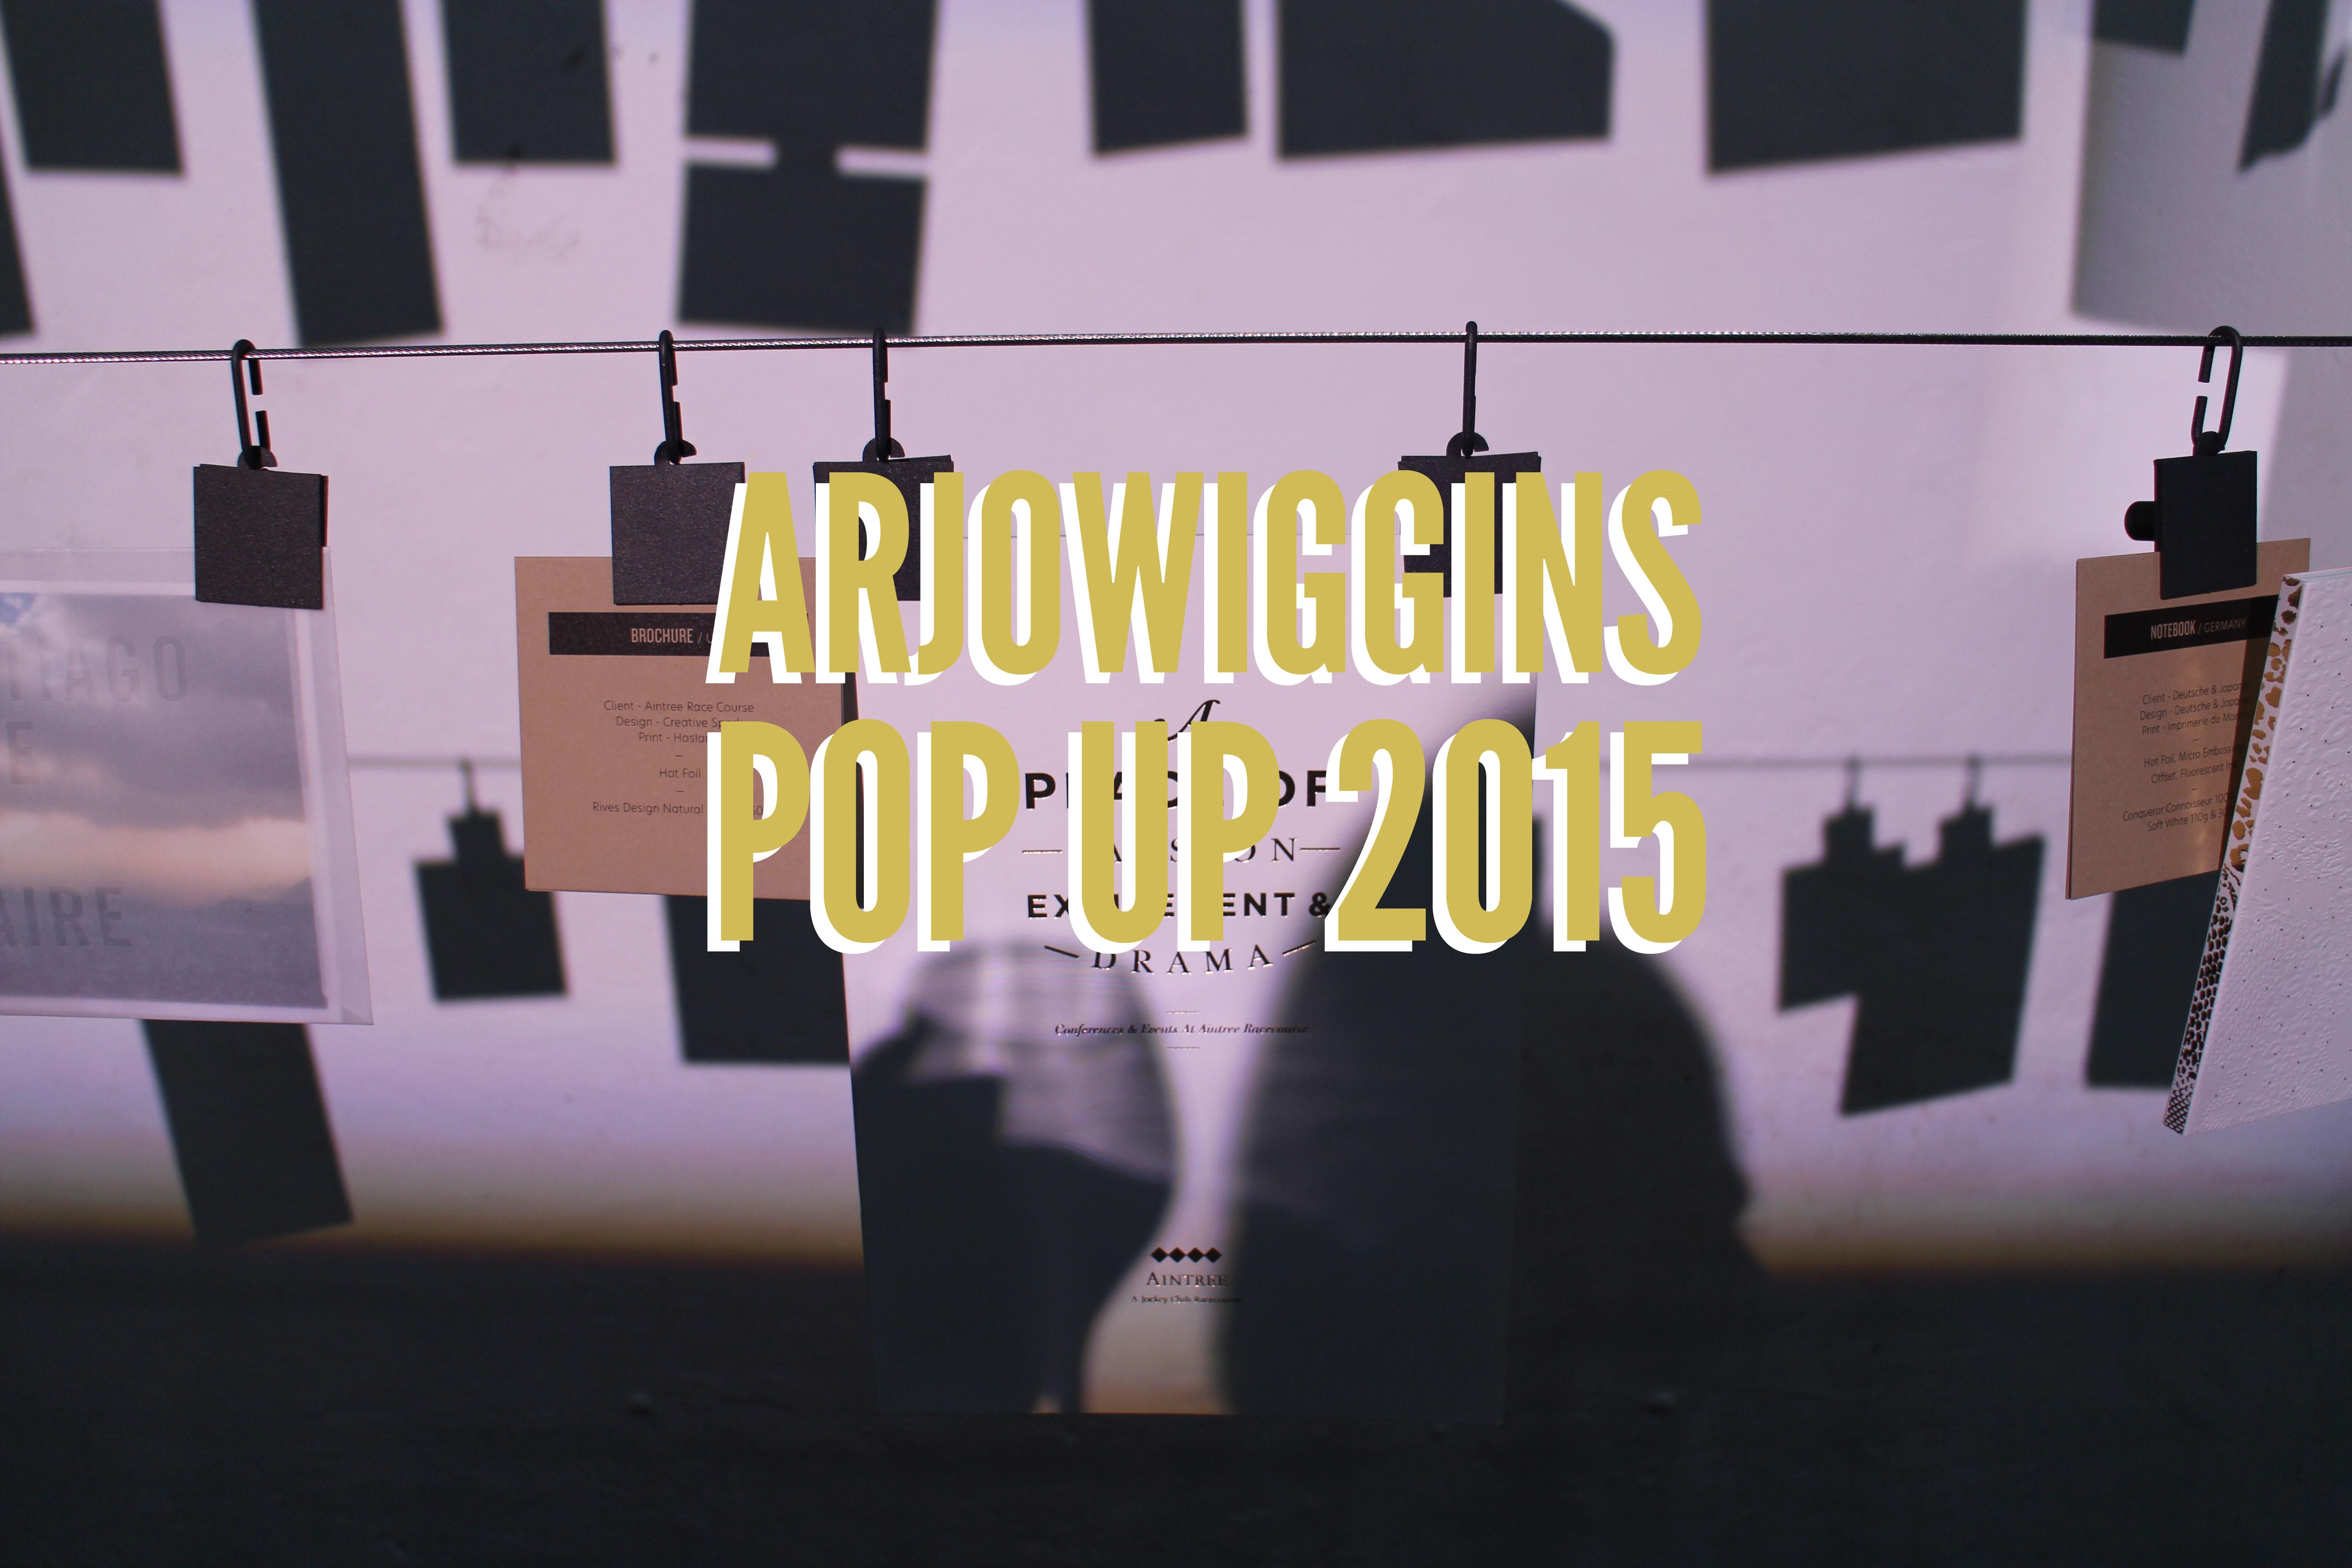 https://graphiquefantastique.com/wp-content/uploads/2015/04/ArjowigginsPopUp2015.jpg